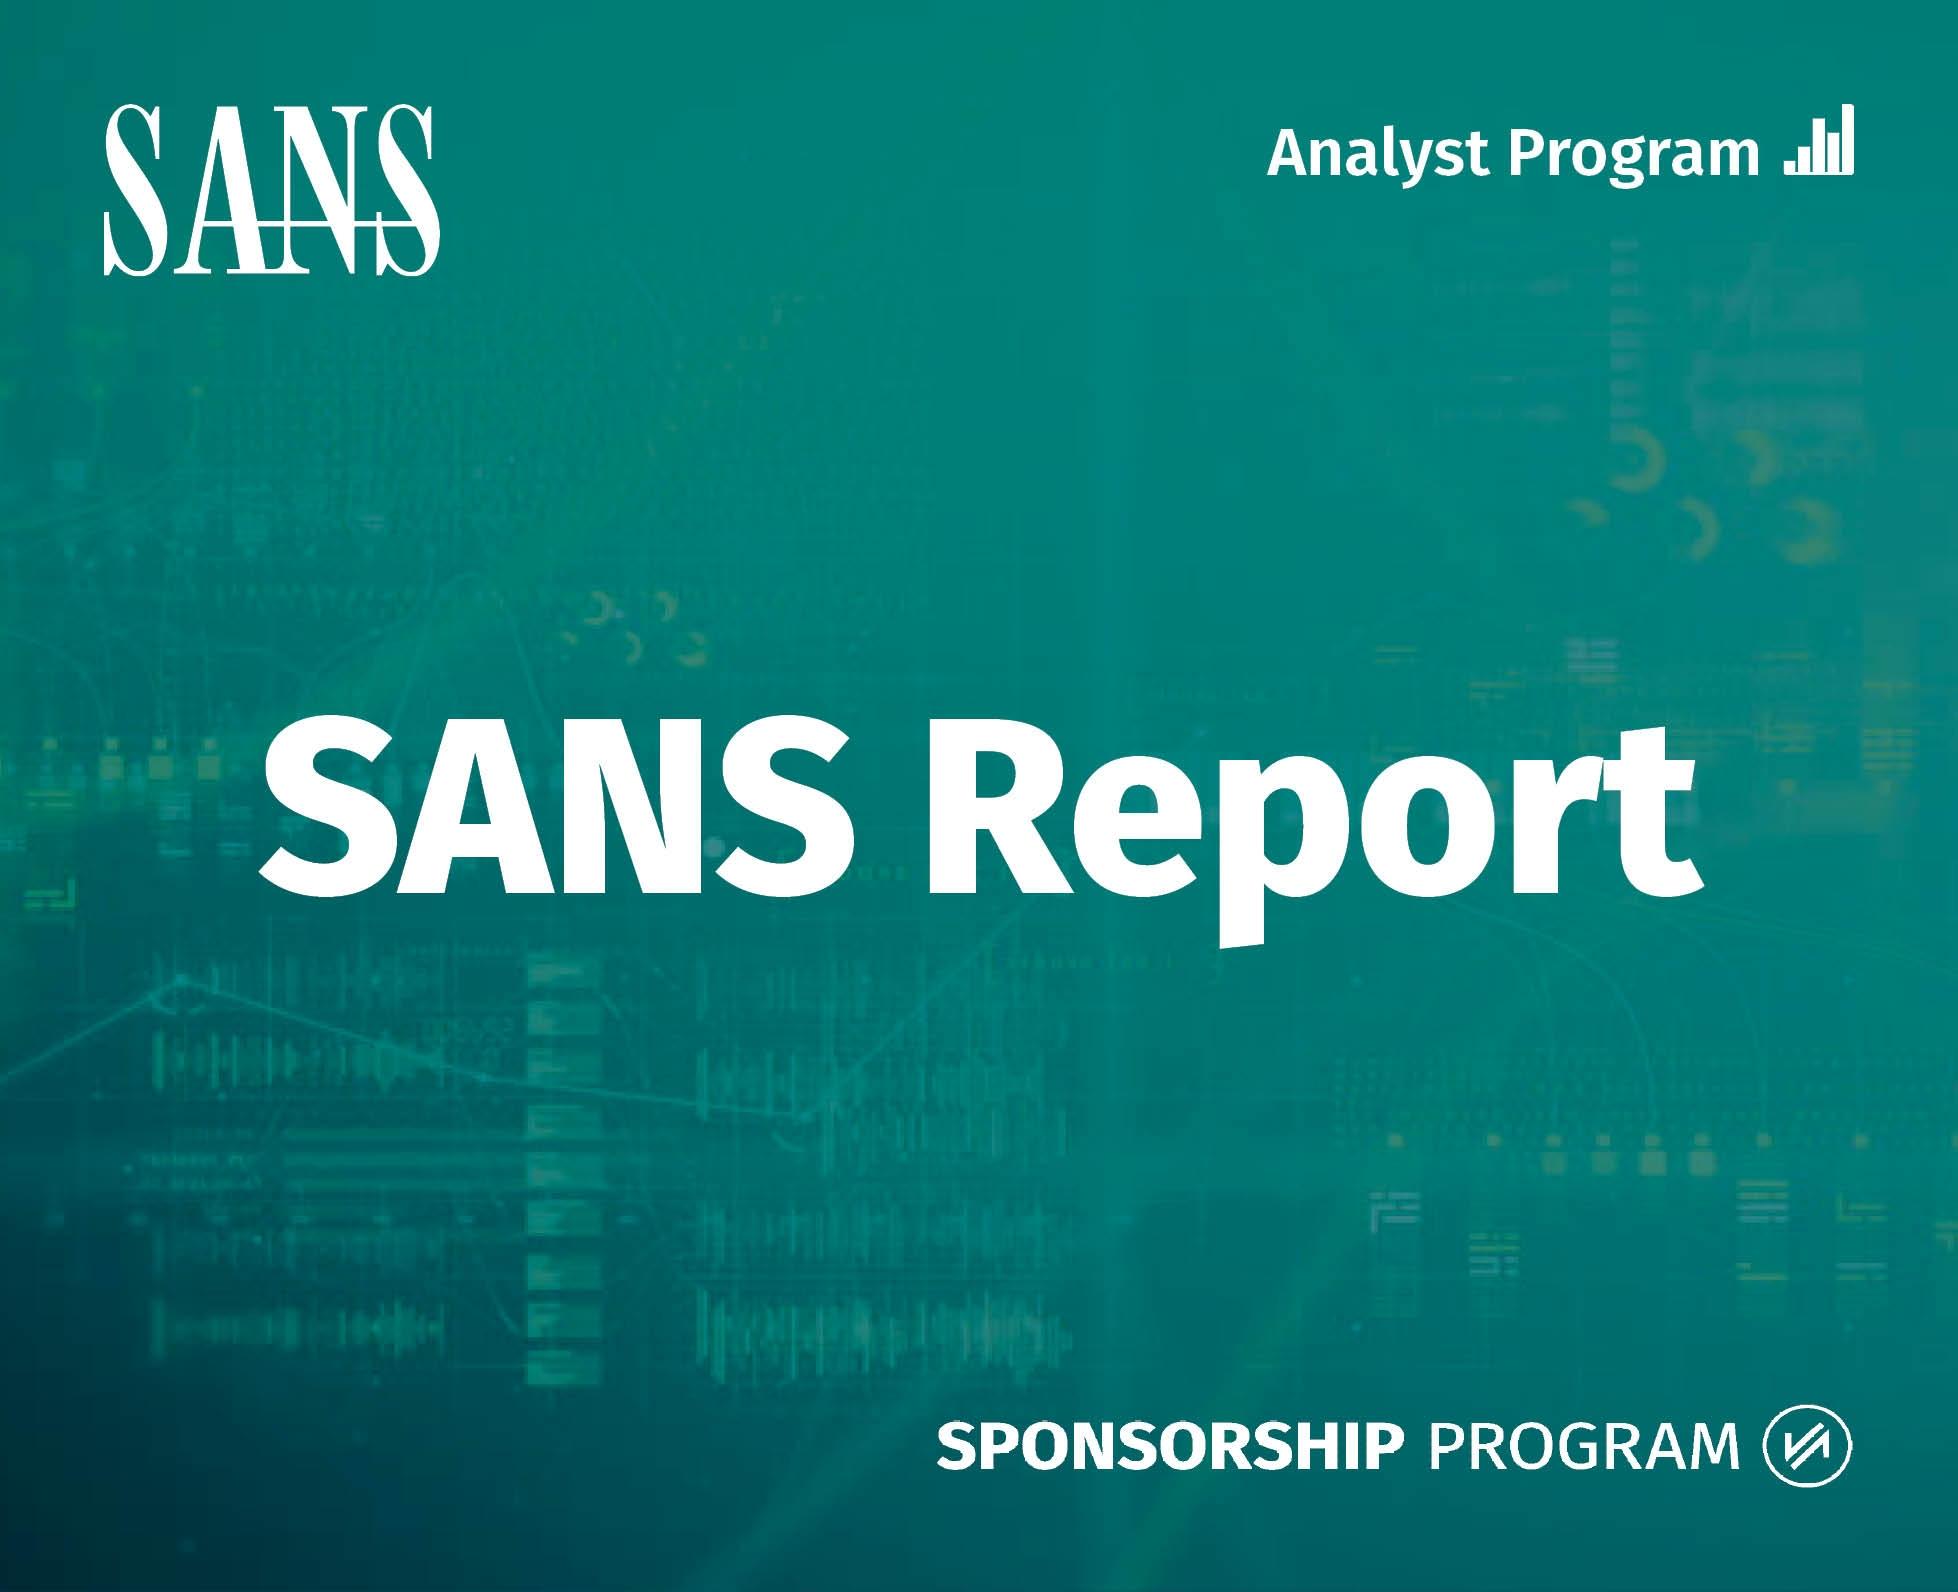 Analyst_Program_-_Report_470x382.jpg